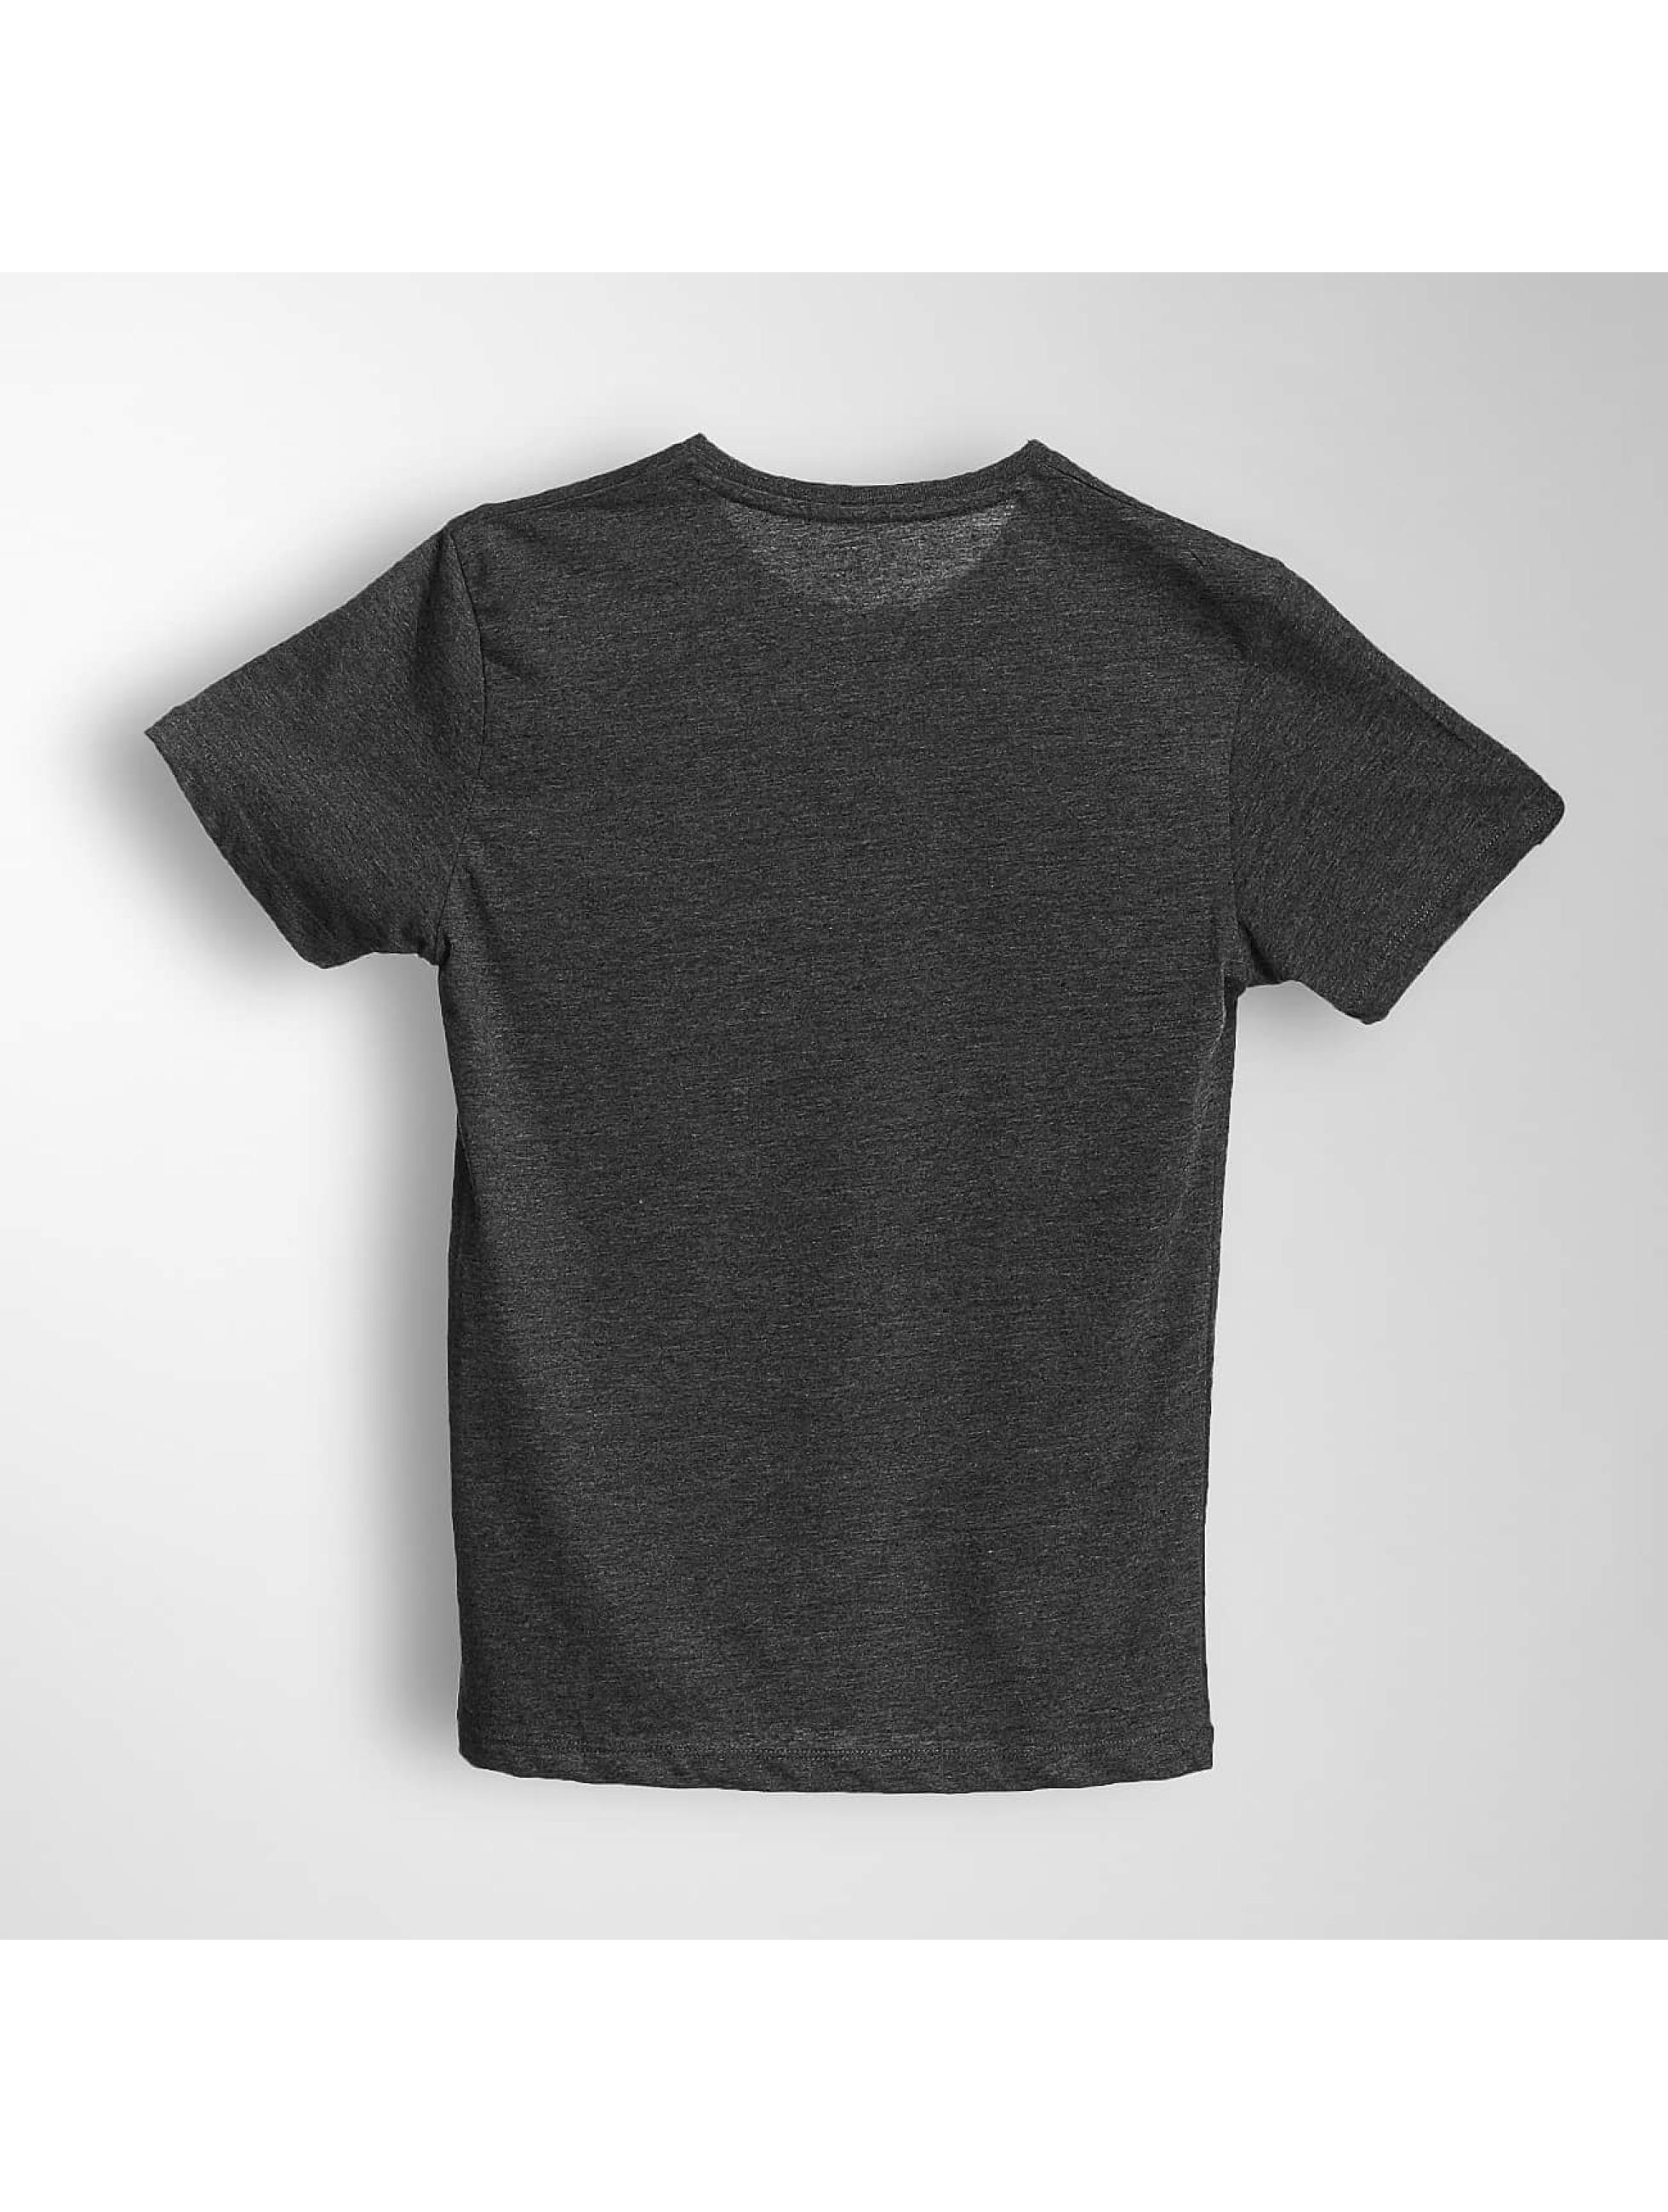 Volcom T-shirt Concentric Hth nero